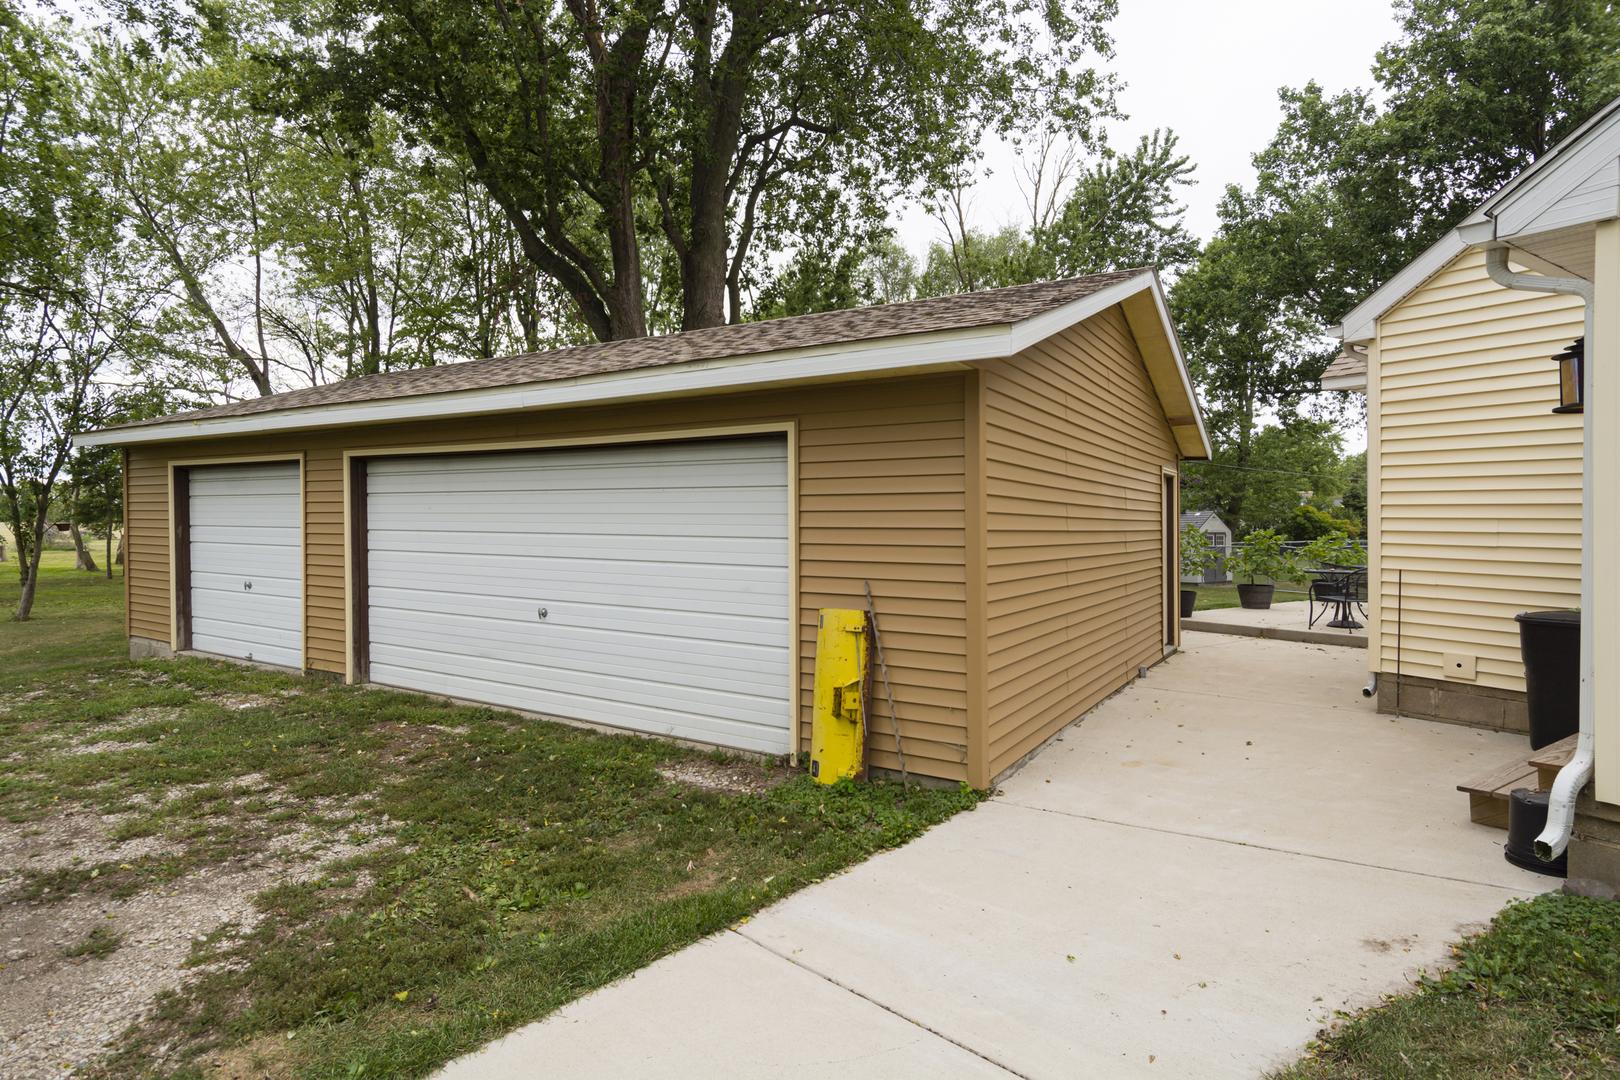 311 North West, Gifford, Illinois, 61847